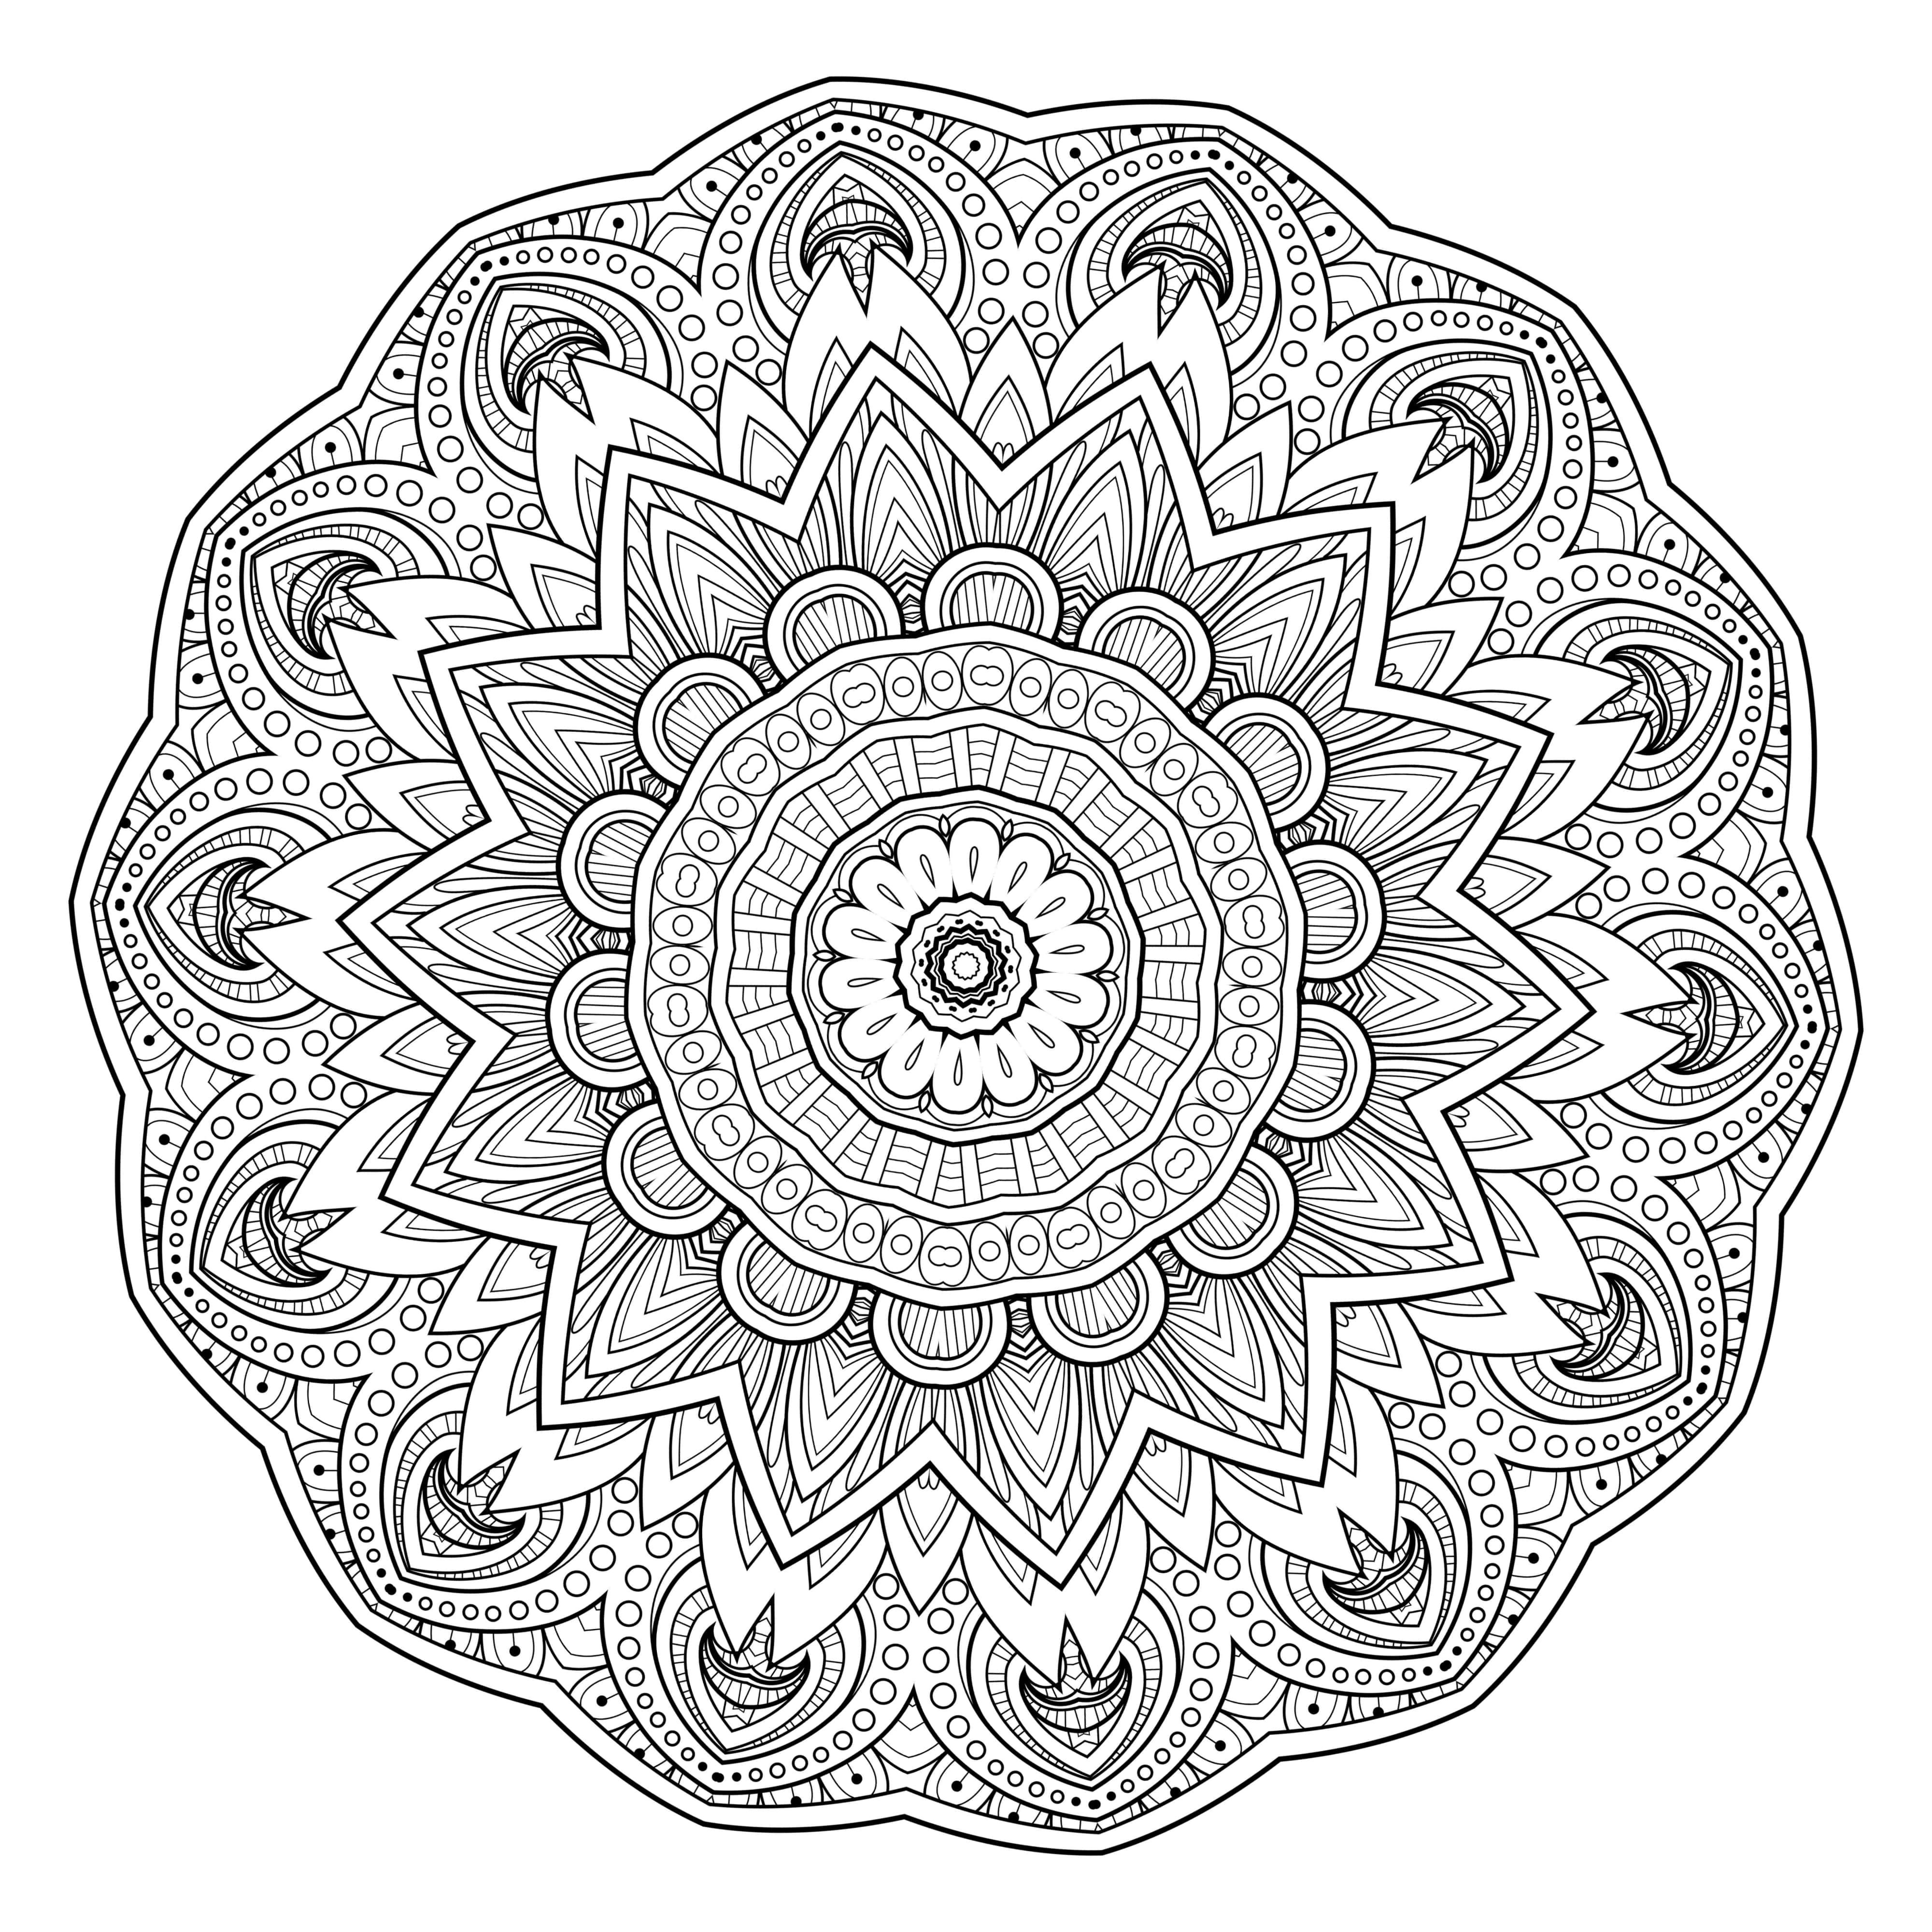 5 Free Printable Coloring Pages: Mandala Templates - Free Printable Mandalas